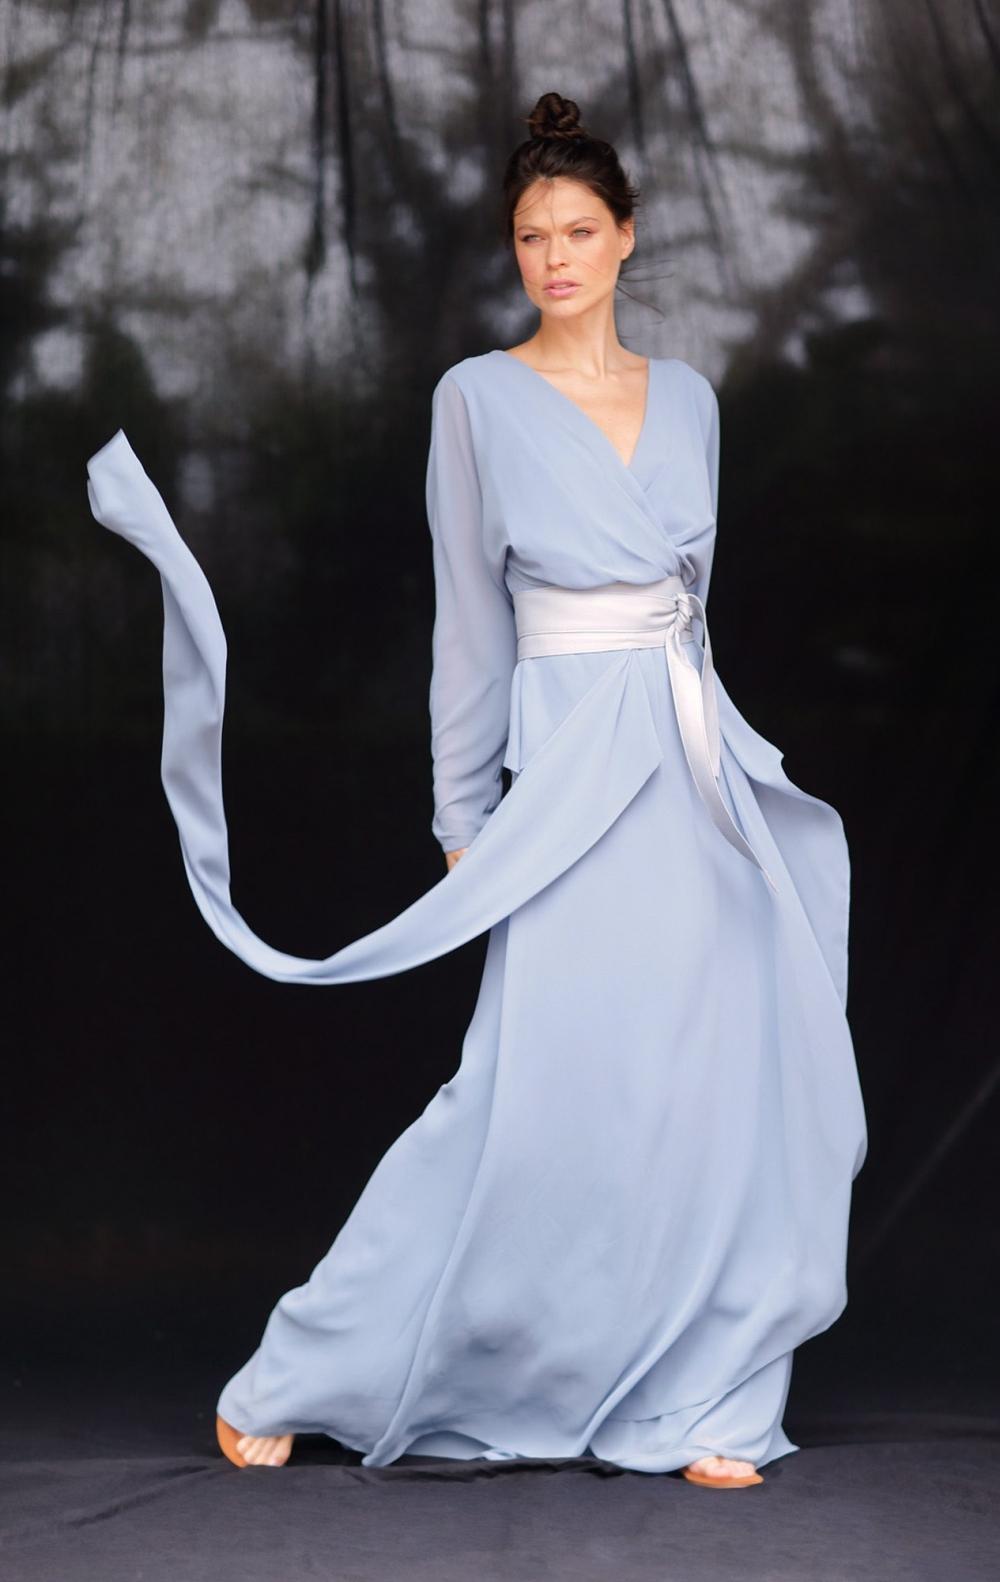 Vestido Musseline Festa Azul Claro  - Foto 3